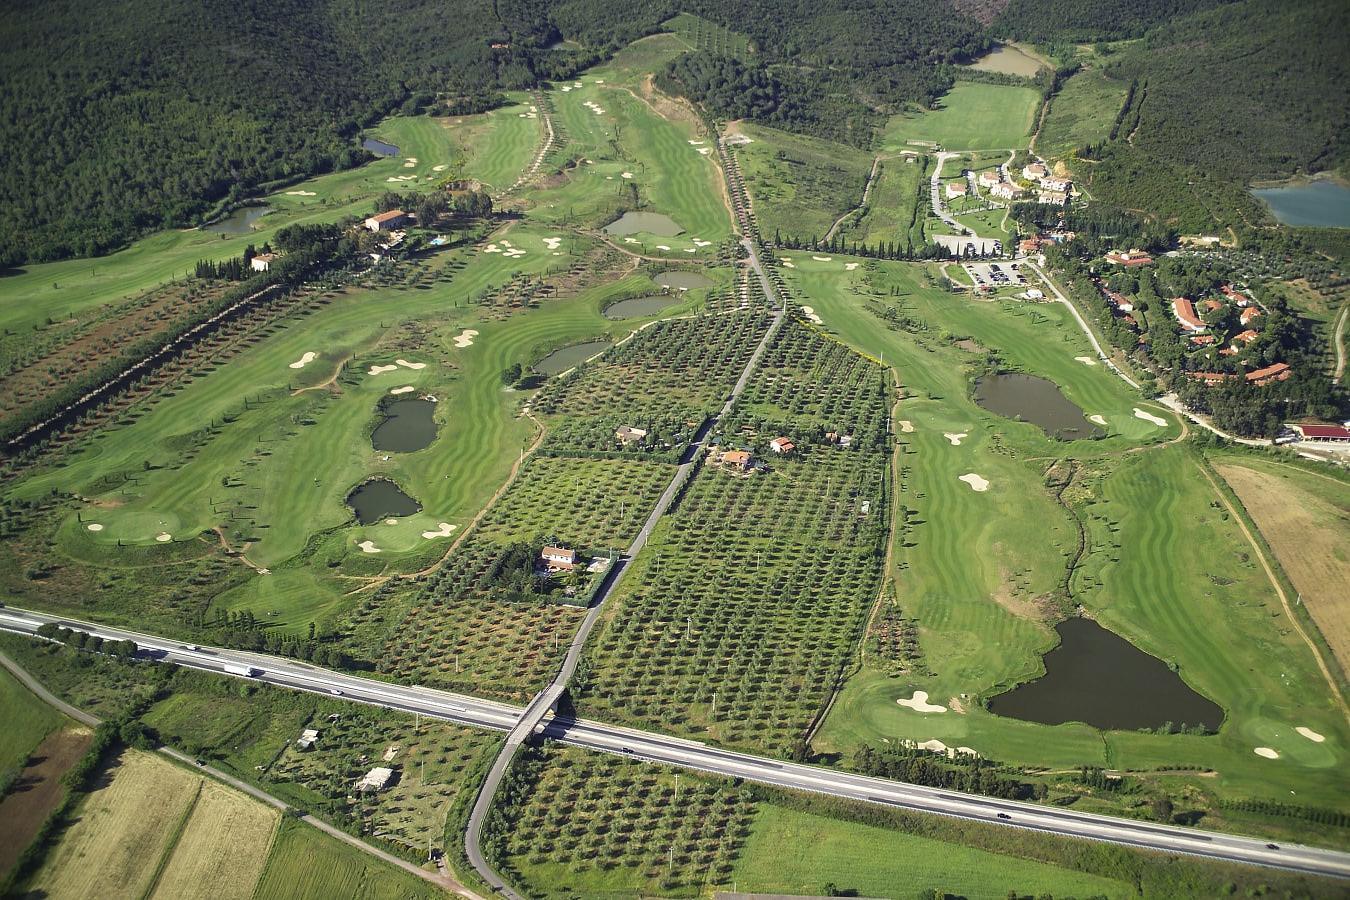 Pelagone Golf Calendario Gare 2021 Gare federali e Trofei giovanili in Toscana, varato il calendario